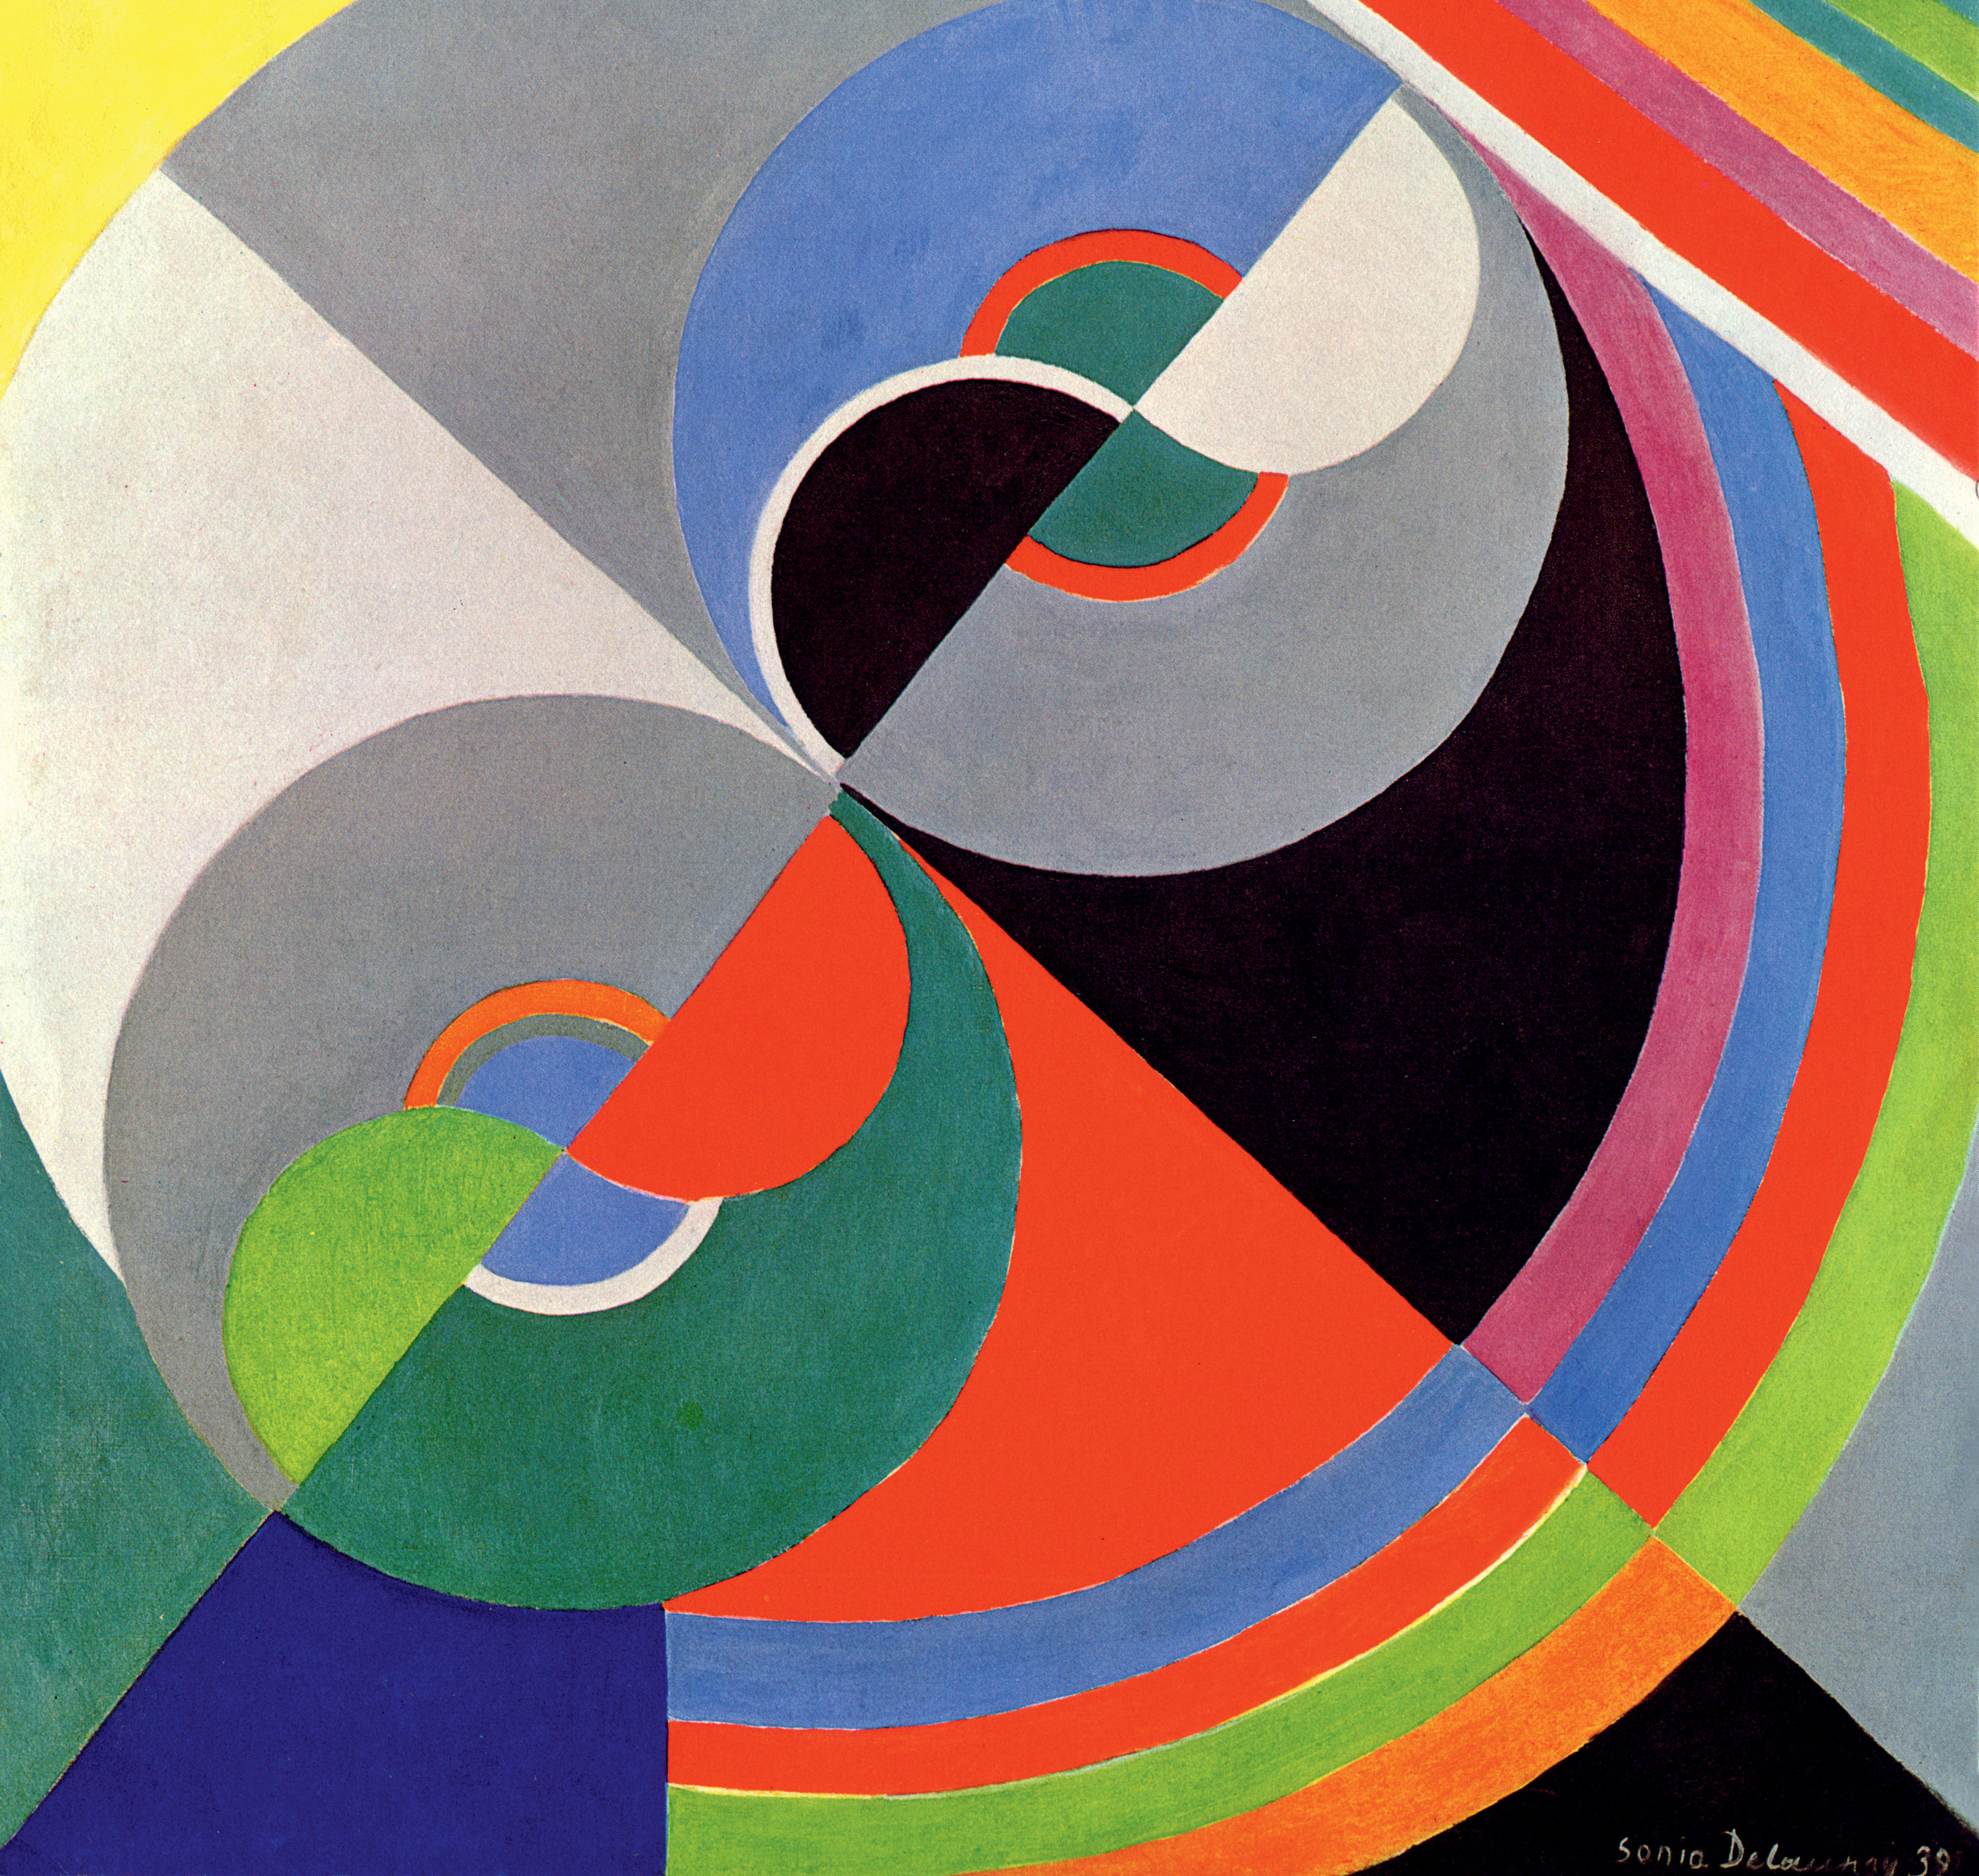 Sonia Delaunay, Rhythm Colour no. 1076 (1939)